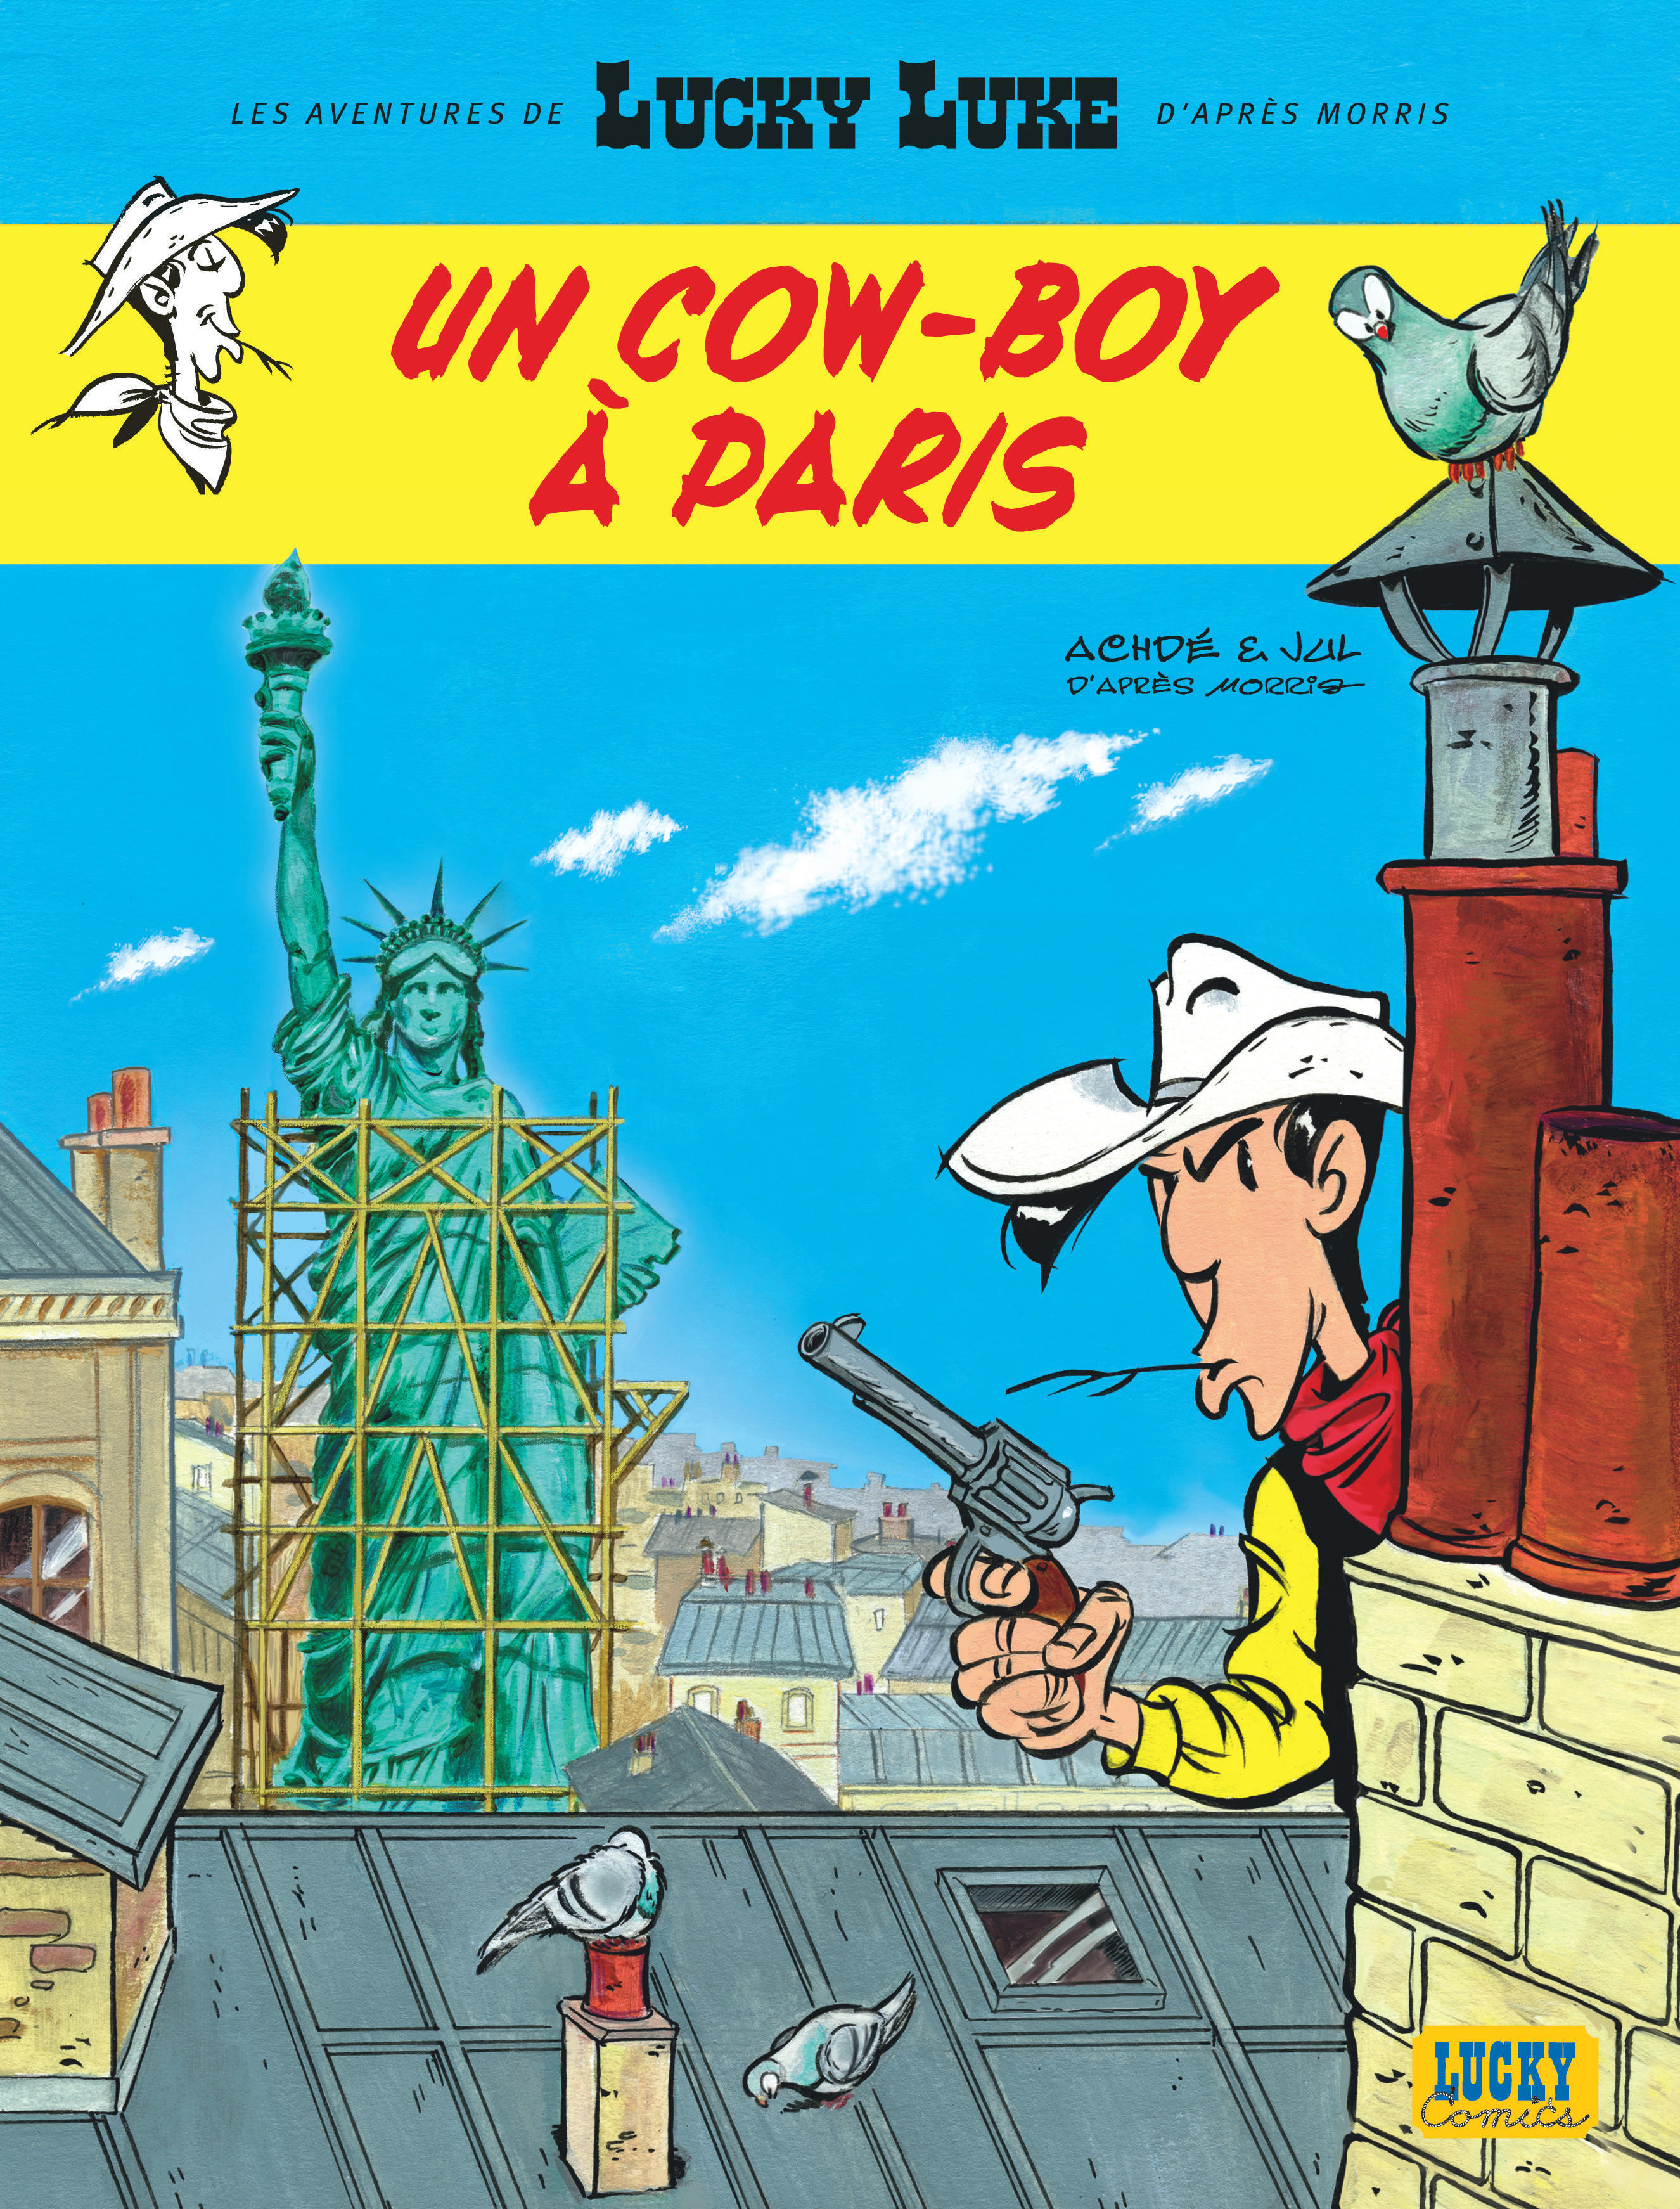 AVENTURES DE LUCKY LUKE D'APRES MORRIS (LES) - TOME 8 - UN COW-BOY A PARIS - NLLES AVENT LUCKY LUKE